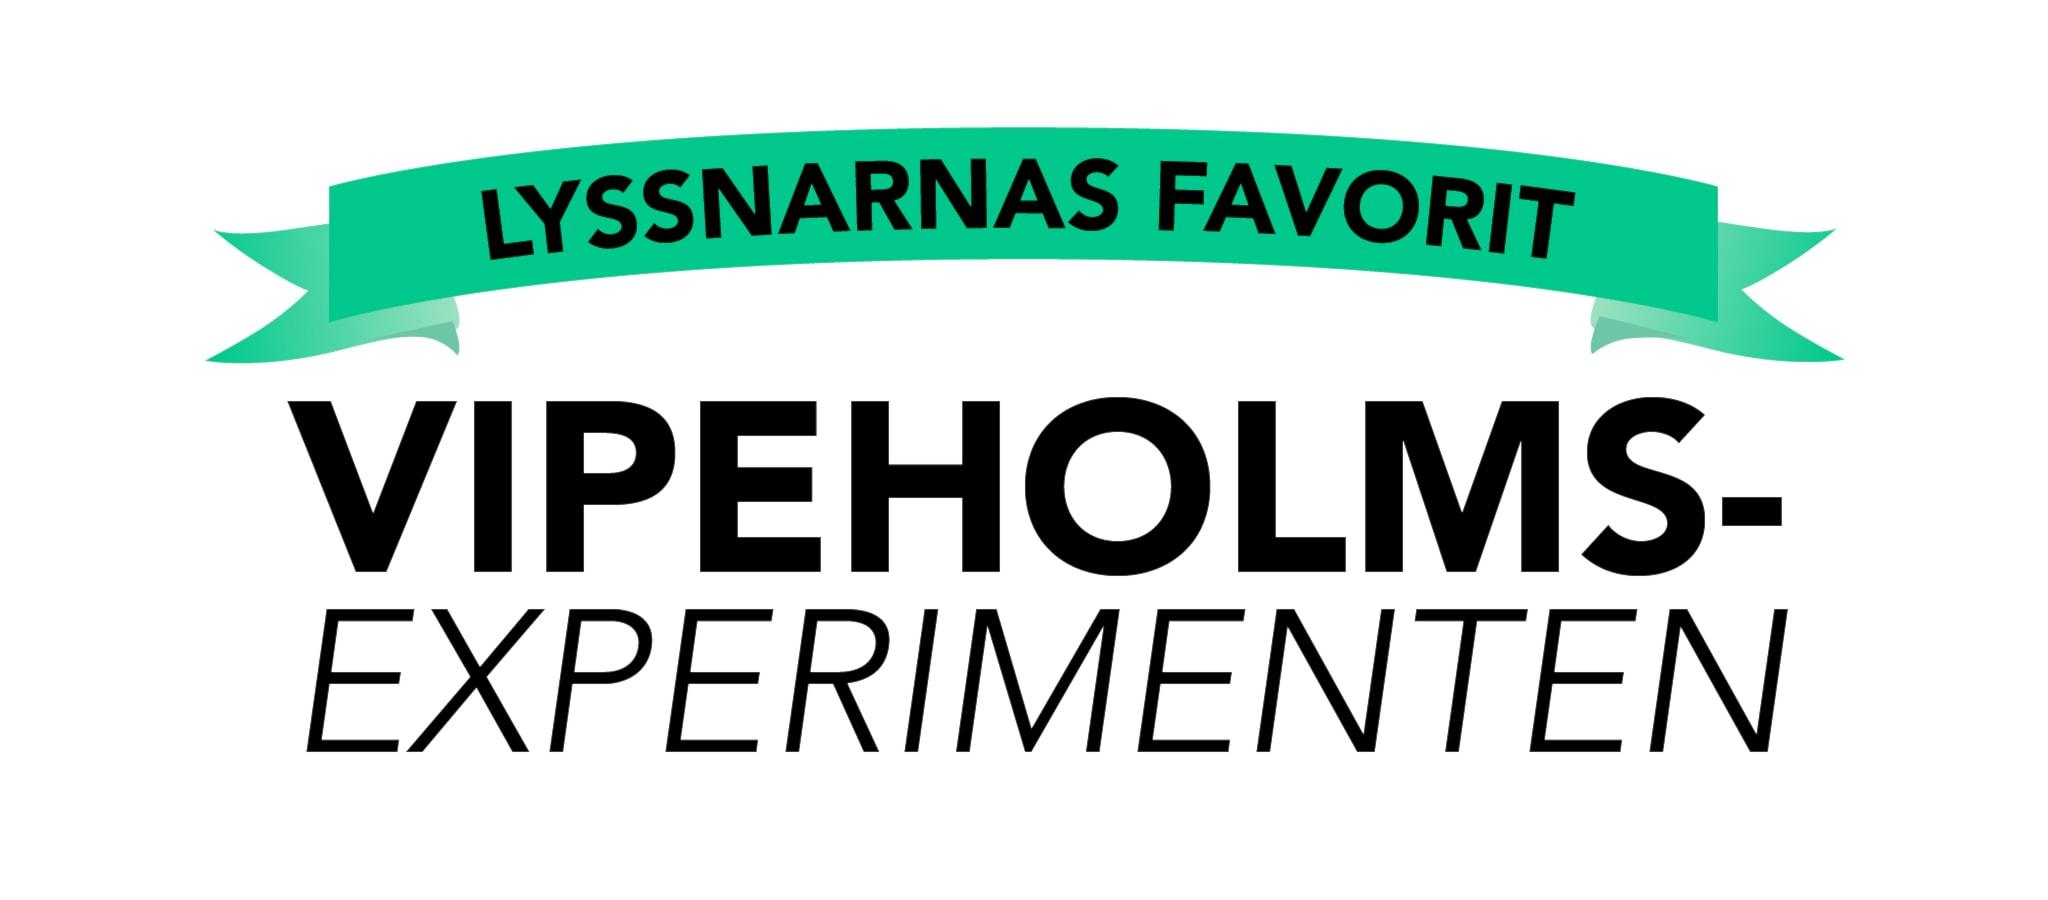 Vipeholmsexperimenten